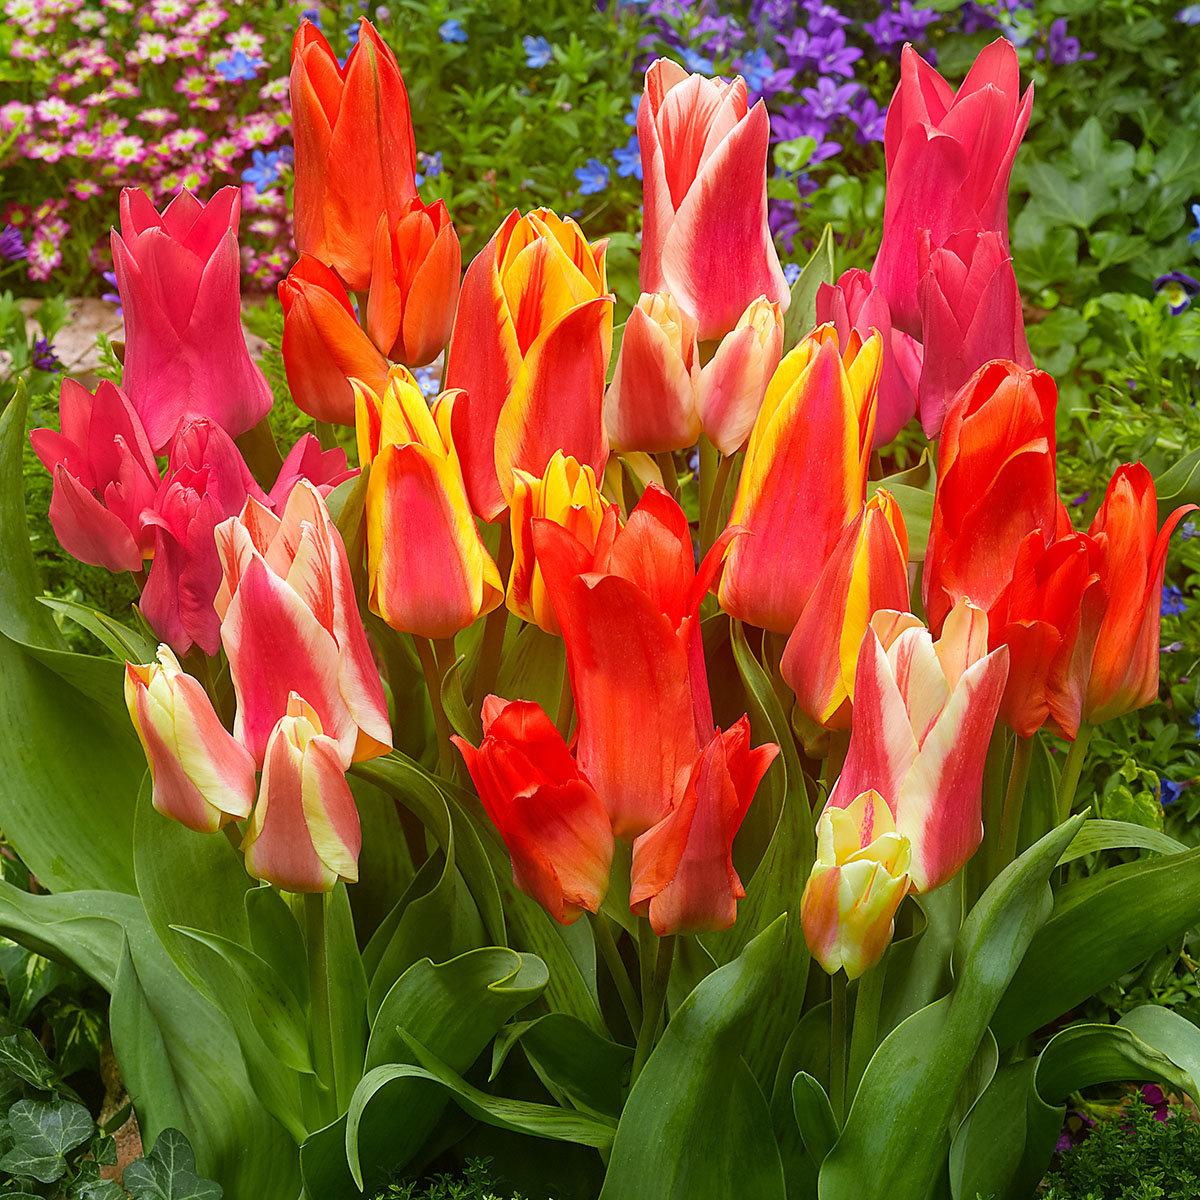 Tulpen-Mischung Canadian Cities